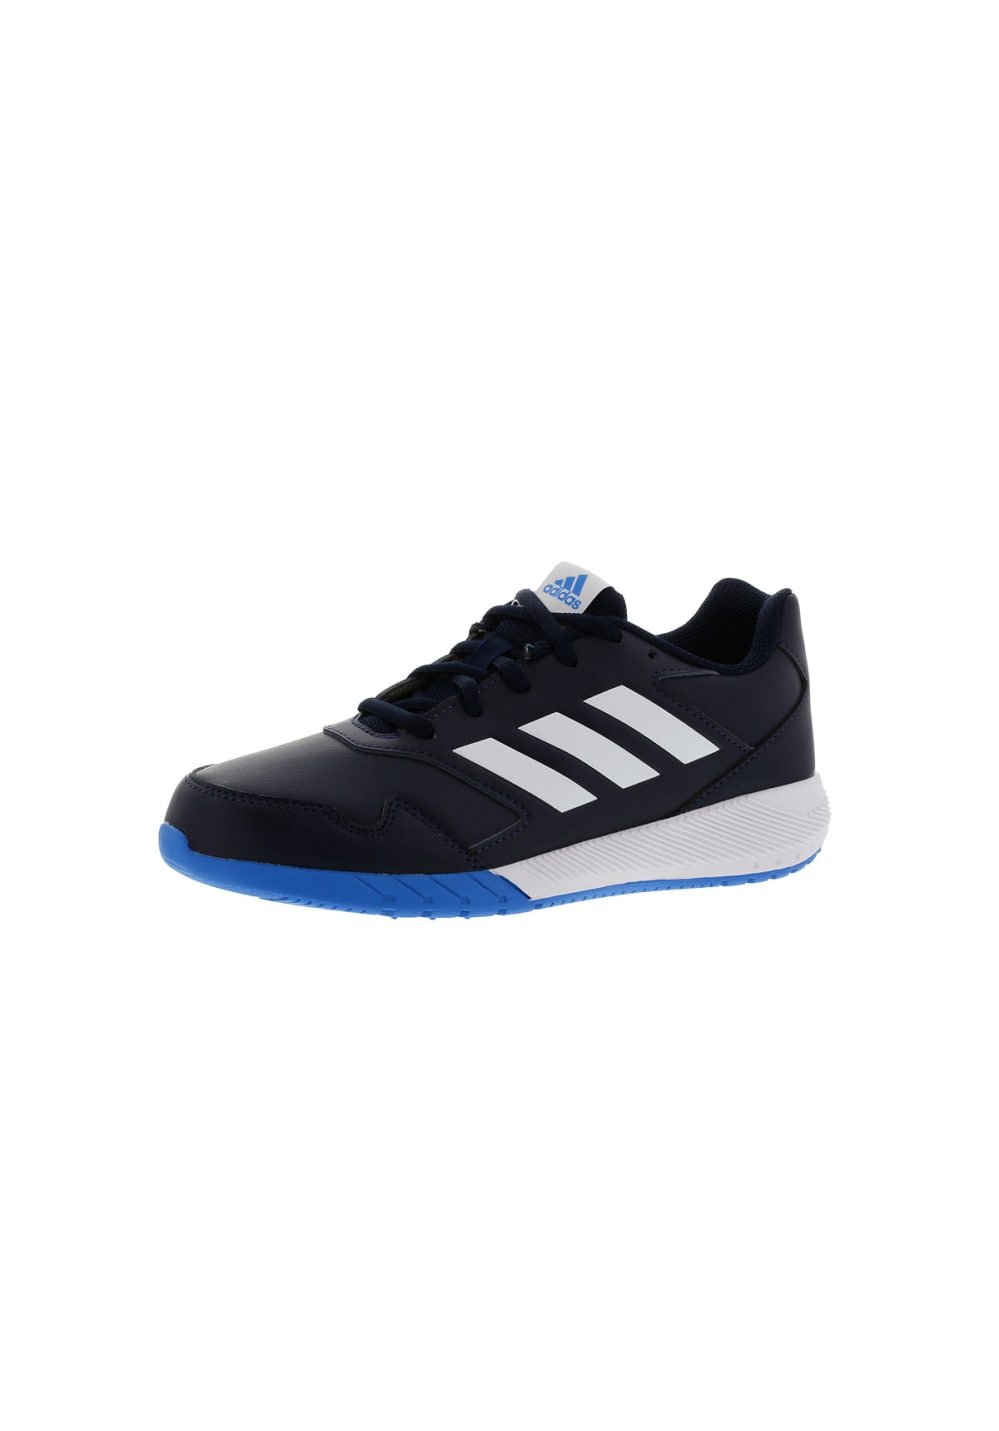 wholesale dealer de6b8 aadfd adidas Altarun - Running shoes - Blue  21RUN